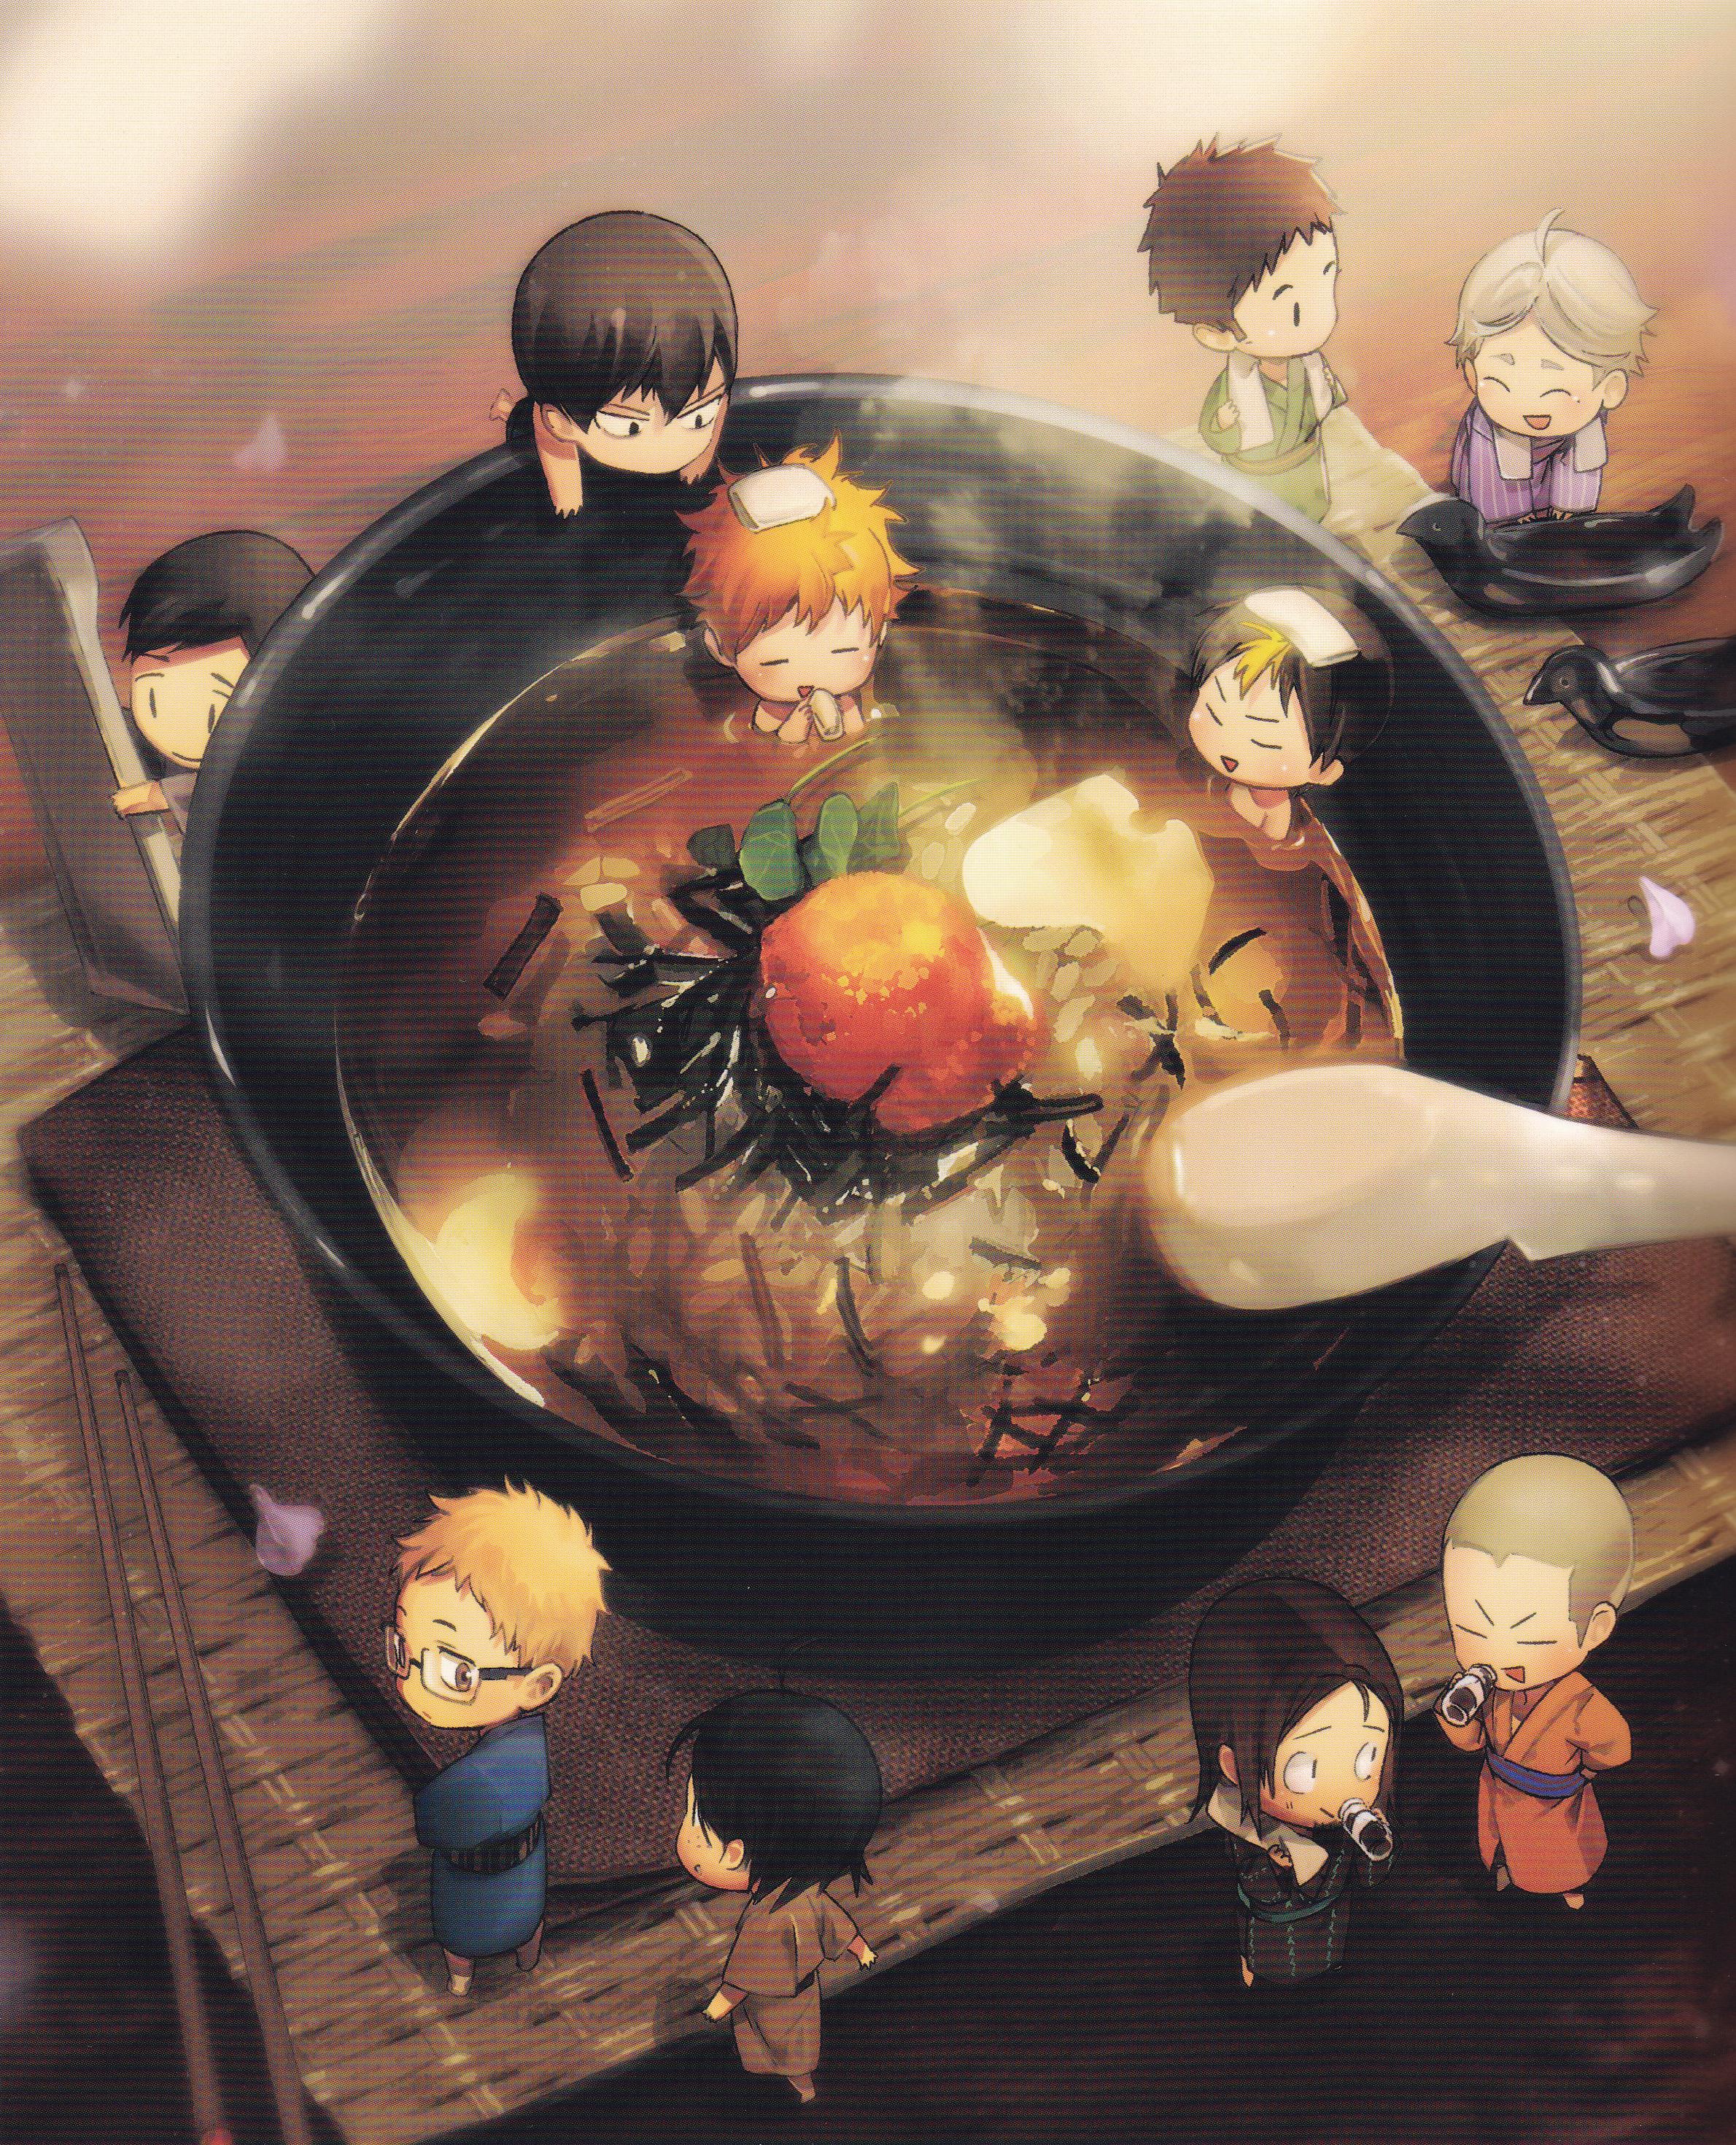 Haikyuu - Haikyuu Food Illustration Book - HD Wallpaper